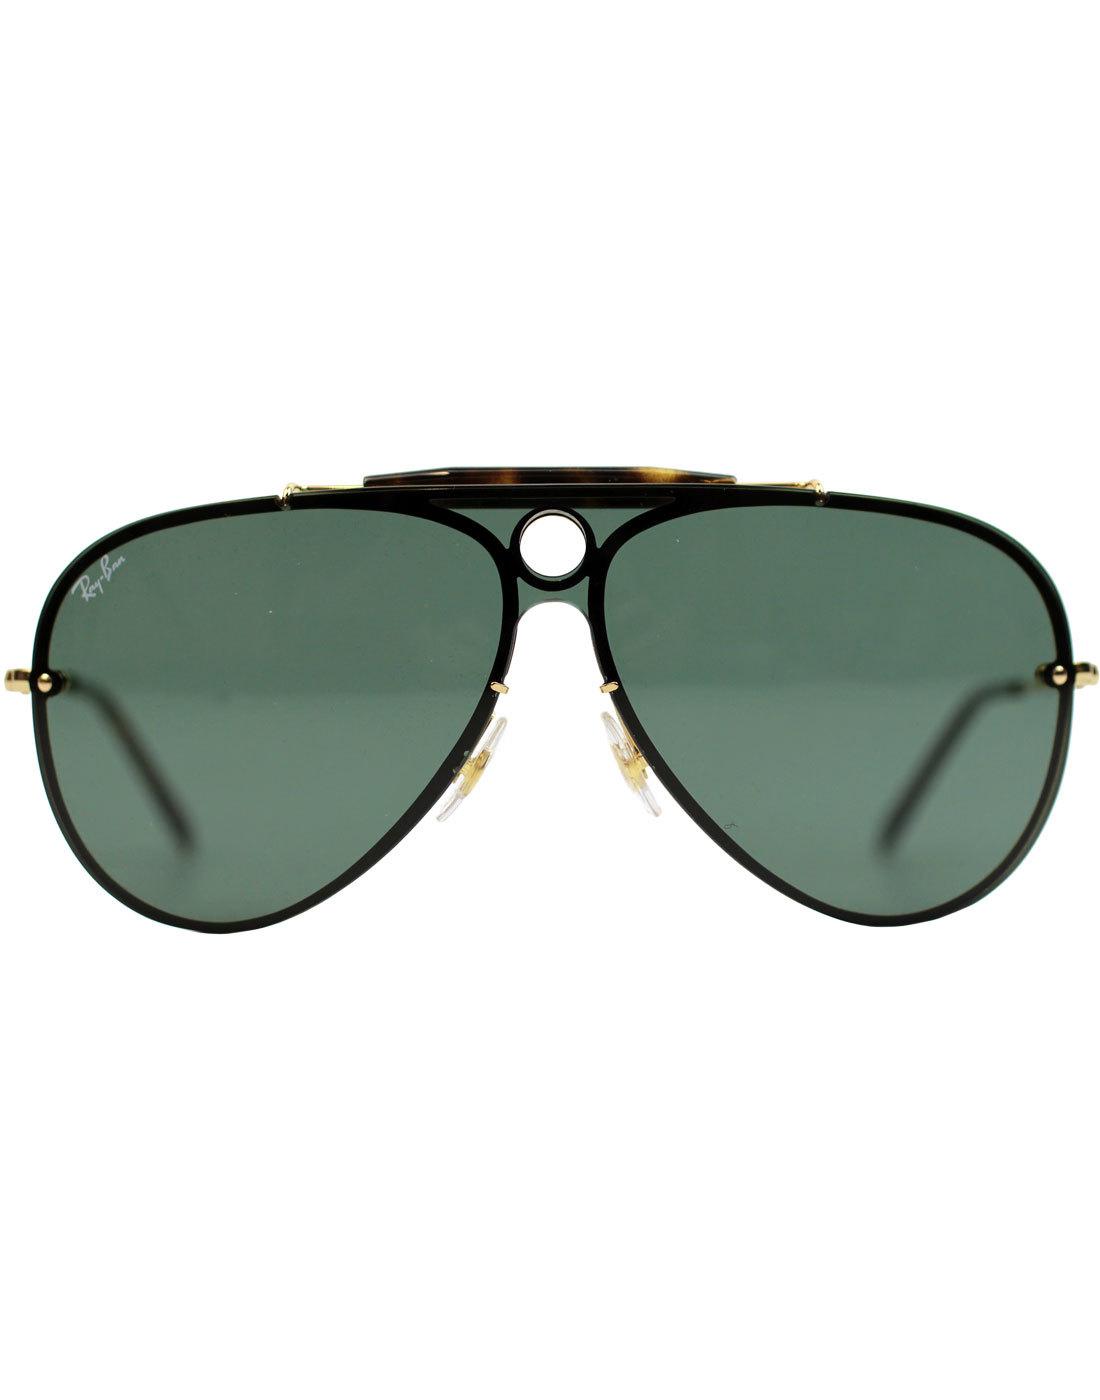 d1d07539c8881d RAY-BAN Blaze Shooter Retro 70s Aviator Sunglasses in Gold Green